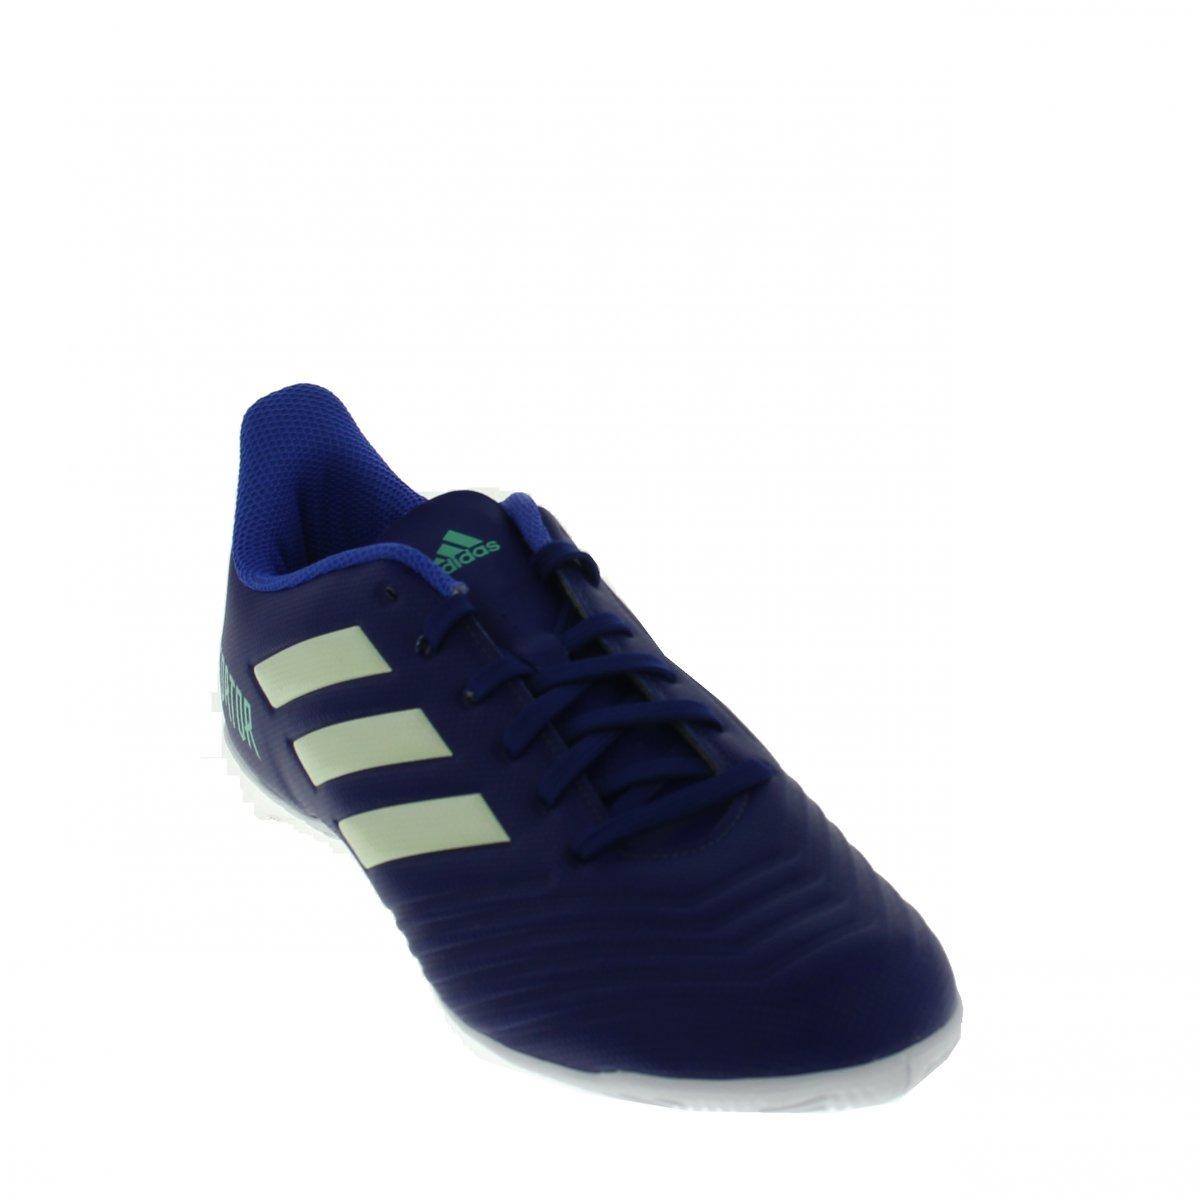 ... chuteira futsal adidas predator tango 18.4 in azul. Carregando zoom.  affordable price bc53a 0f0bc ... b3a4880ac99ae